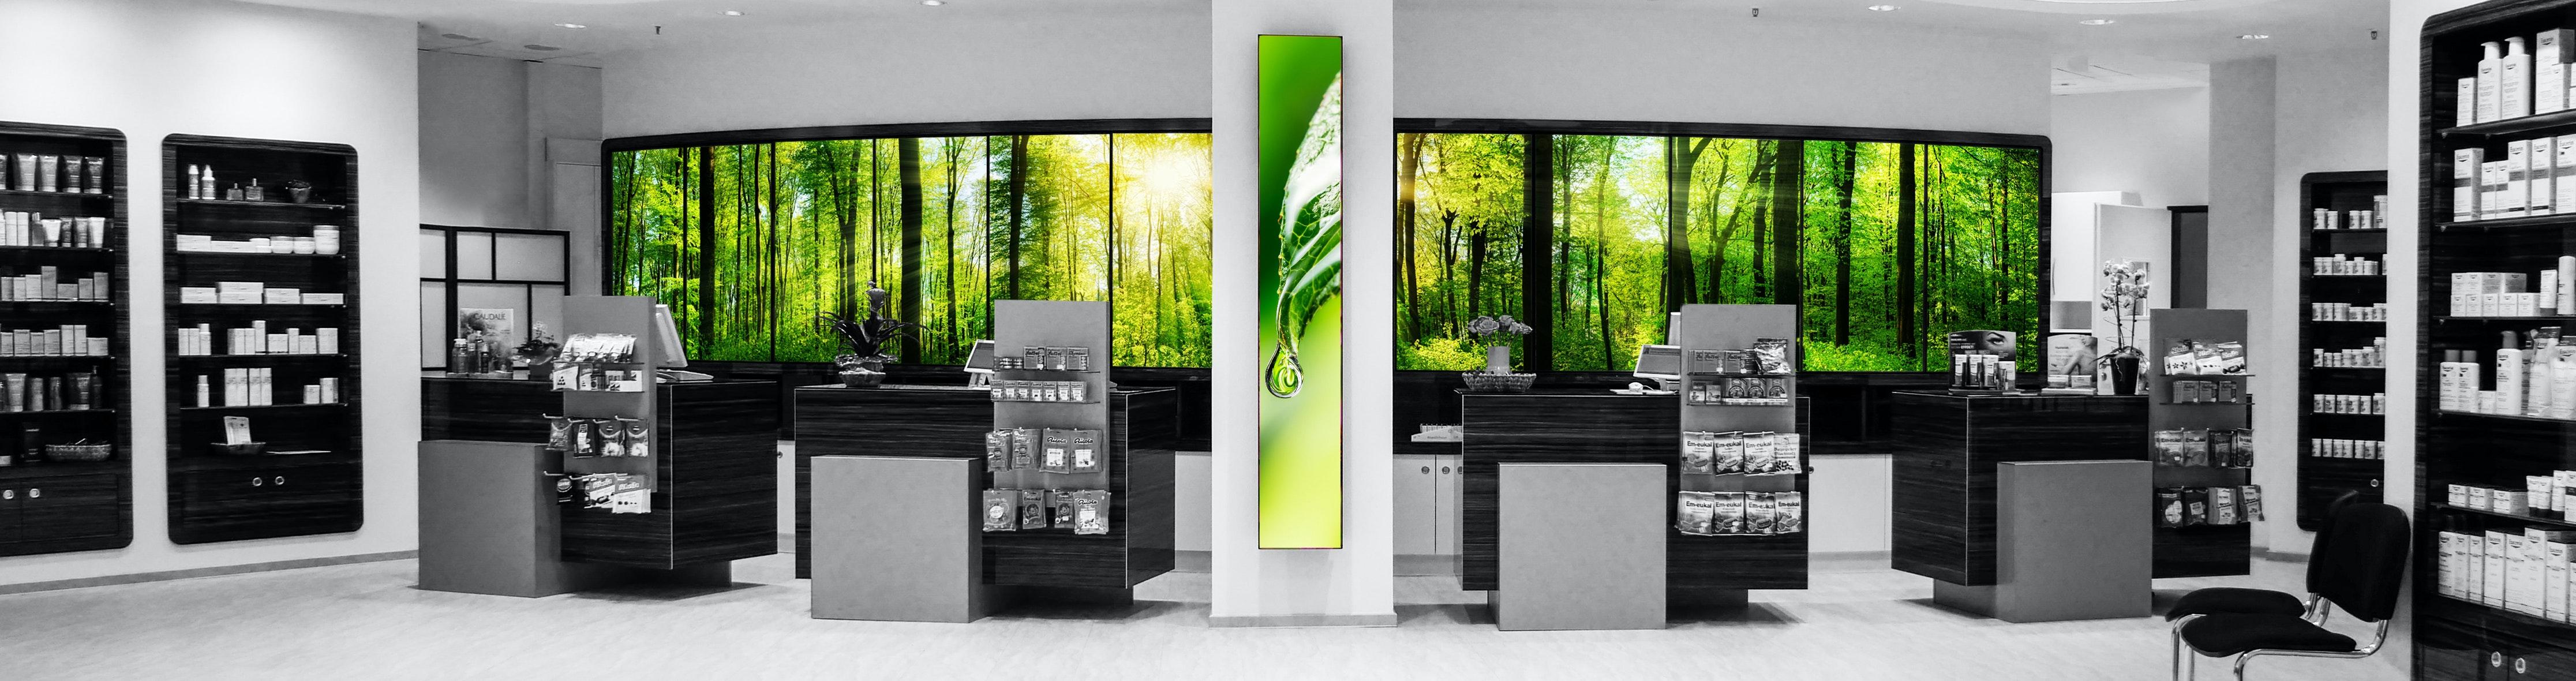 Apostore Adcommander Digitale Loesungen Apotheke panorama wall wald3